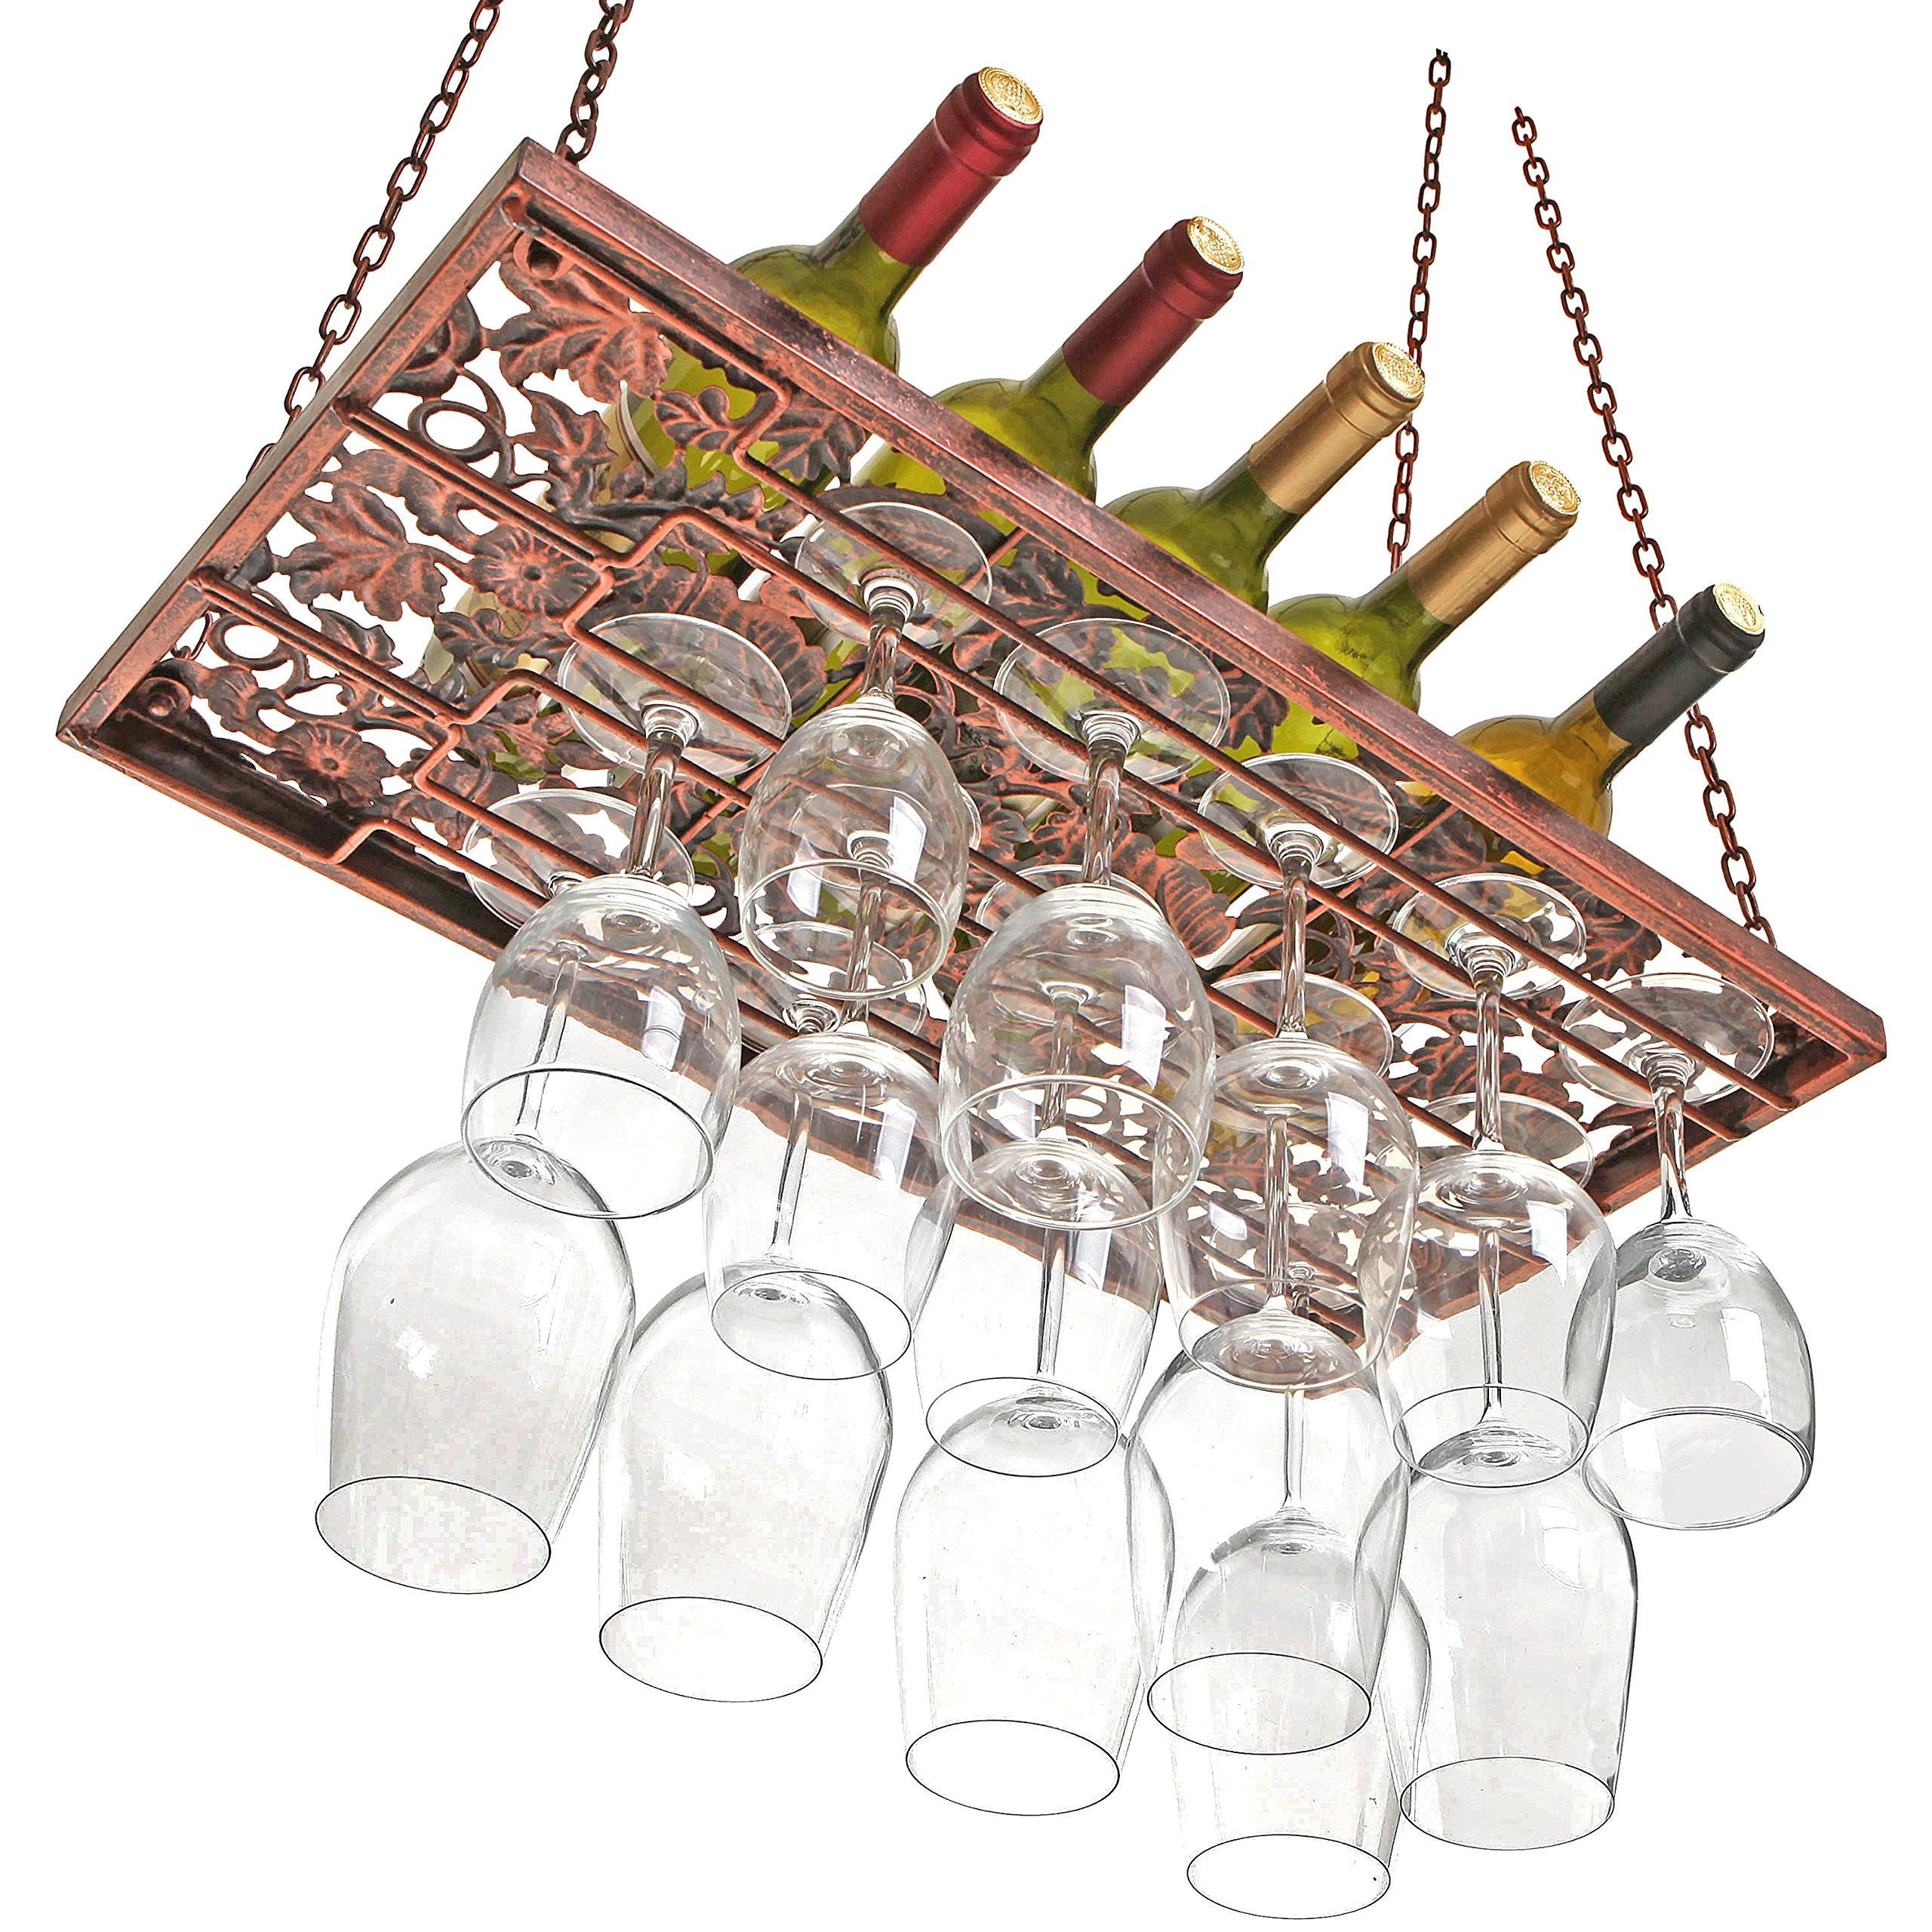 Vineyard Country Rustic Bronze Metal Ceiling Mounted Hanging Stemware Wine Glass Hanger Organizer Rack by MyGift (Image #2)